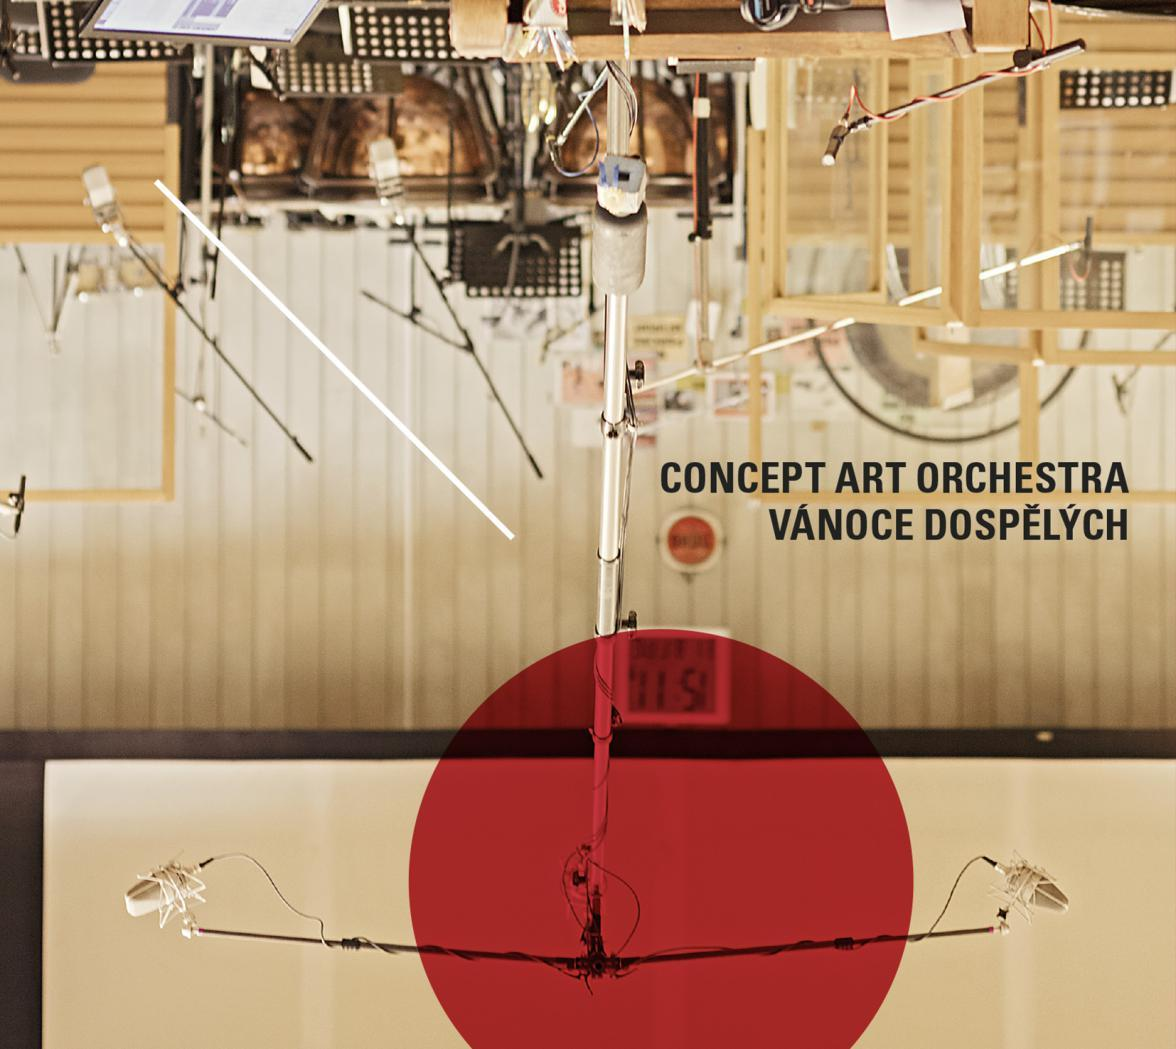 Concept Art Orchestra / Vánoce dospělých